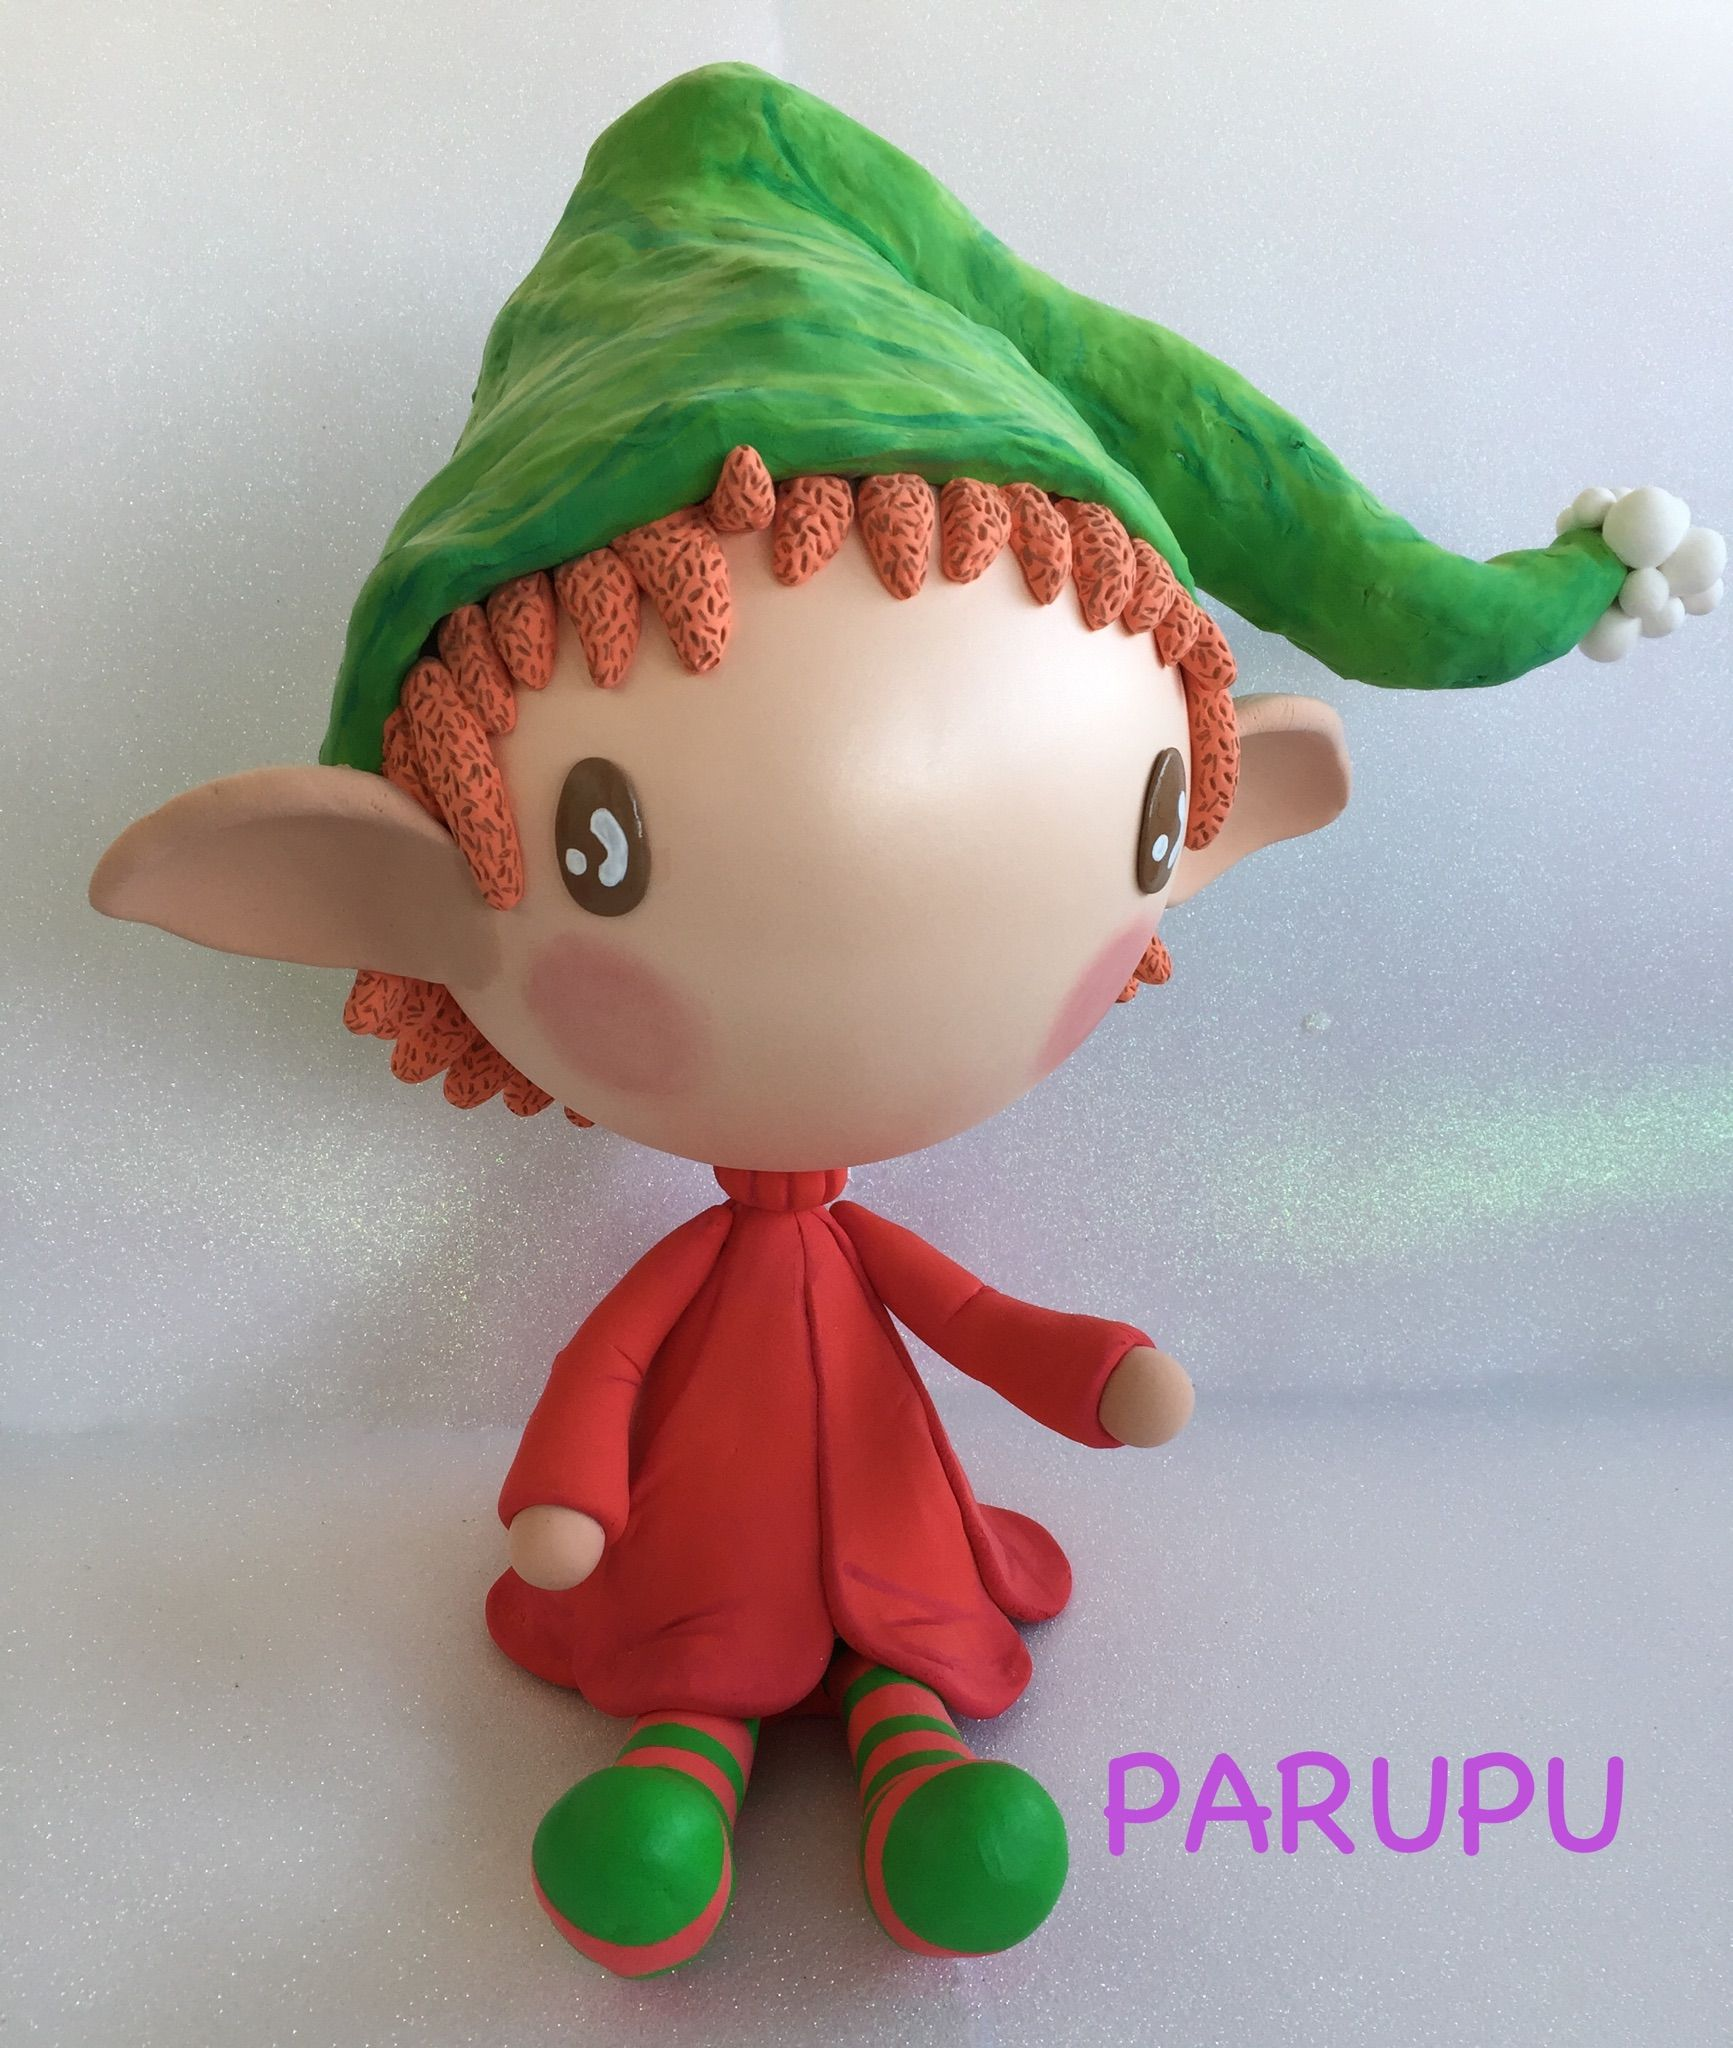 Duende Jumping Clay Parupu Christmas Elf #Parupu #Christmas #Navidad #Decoraci